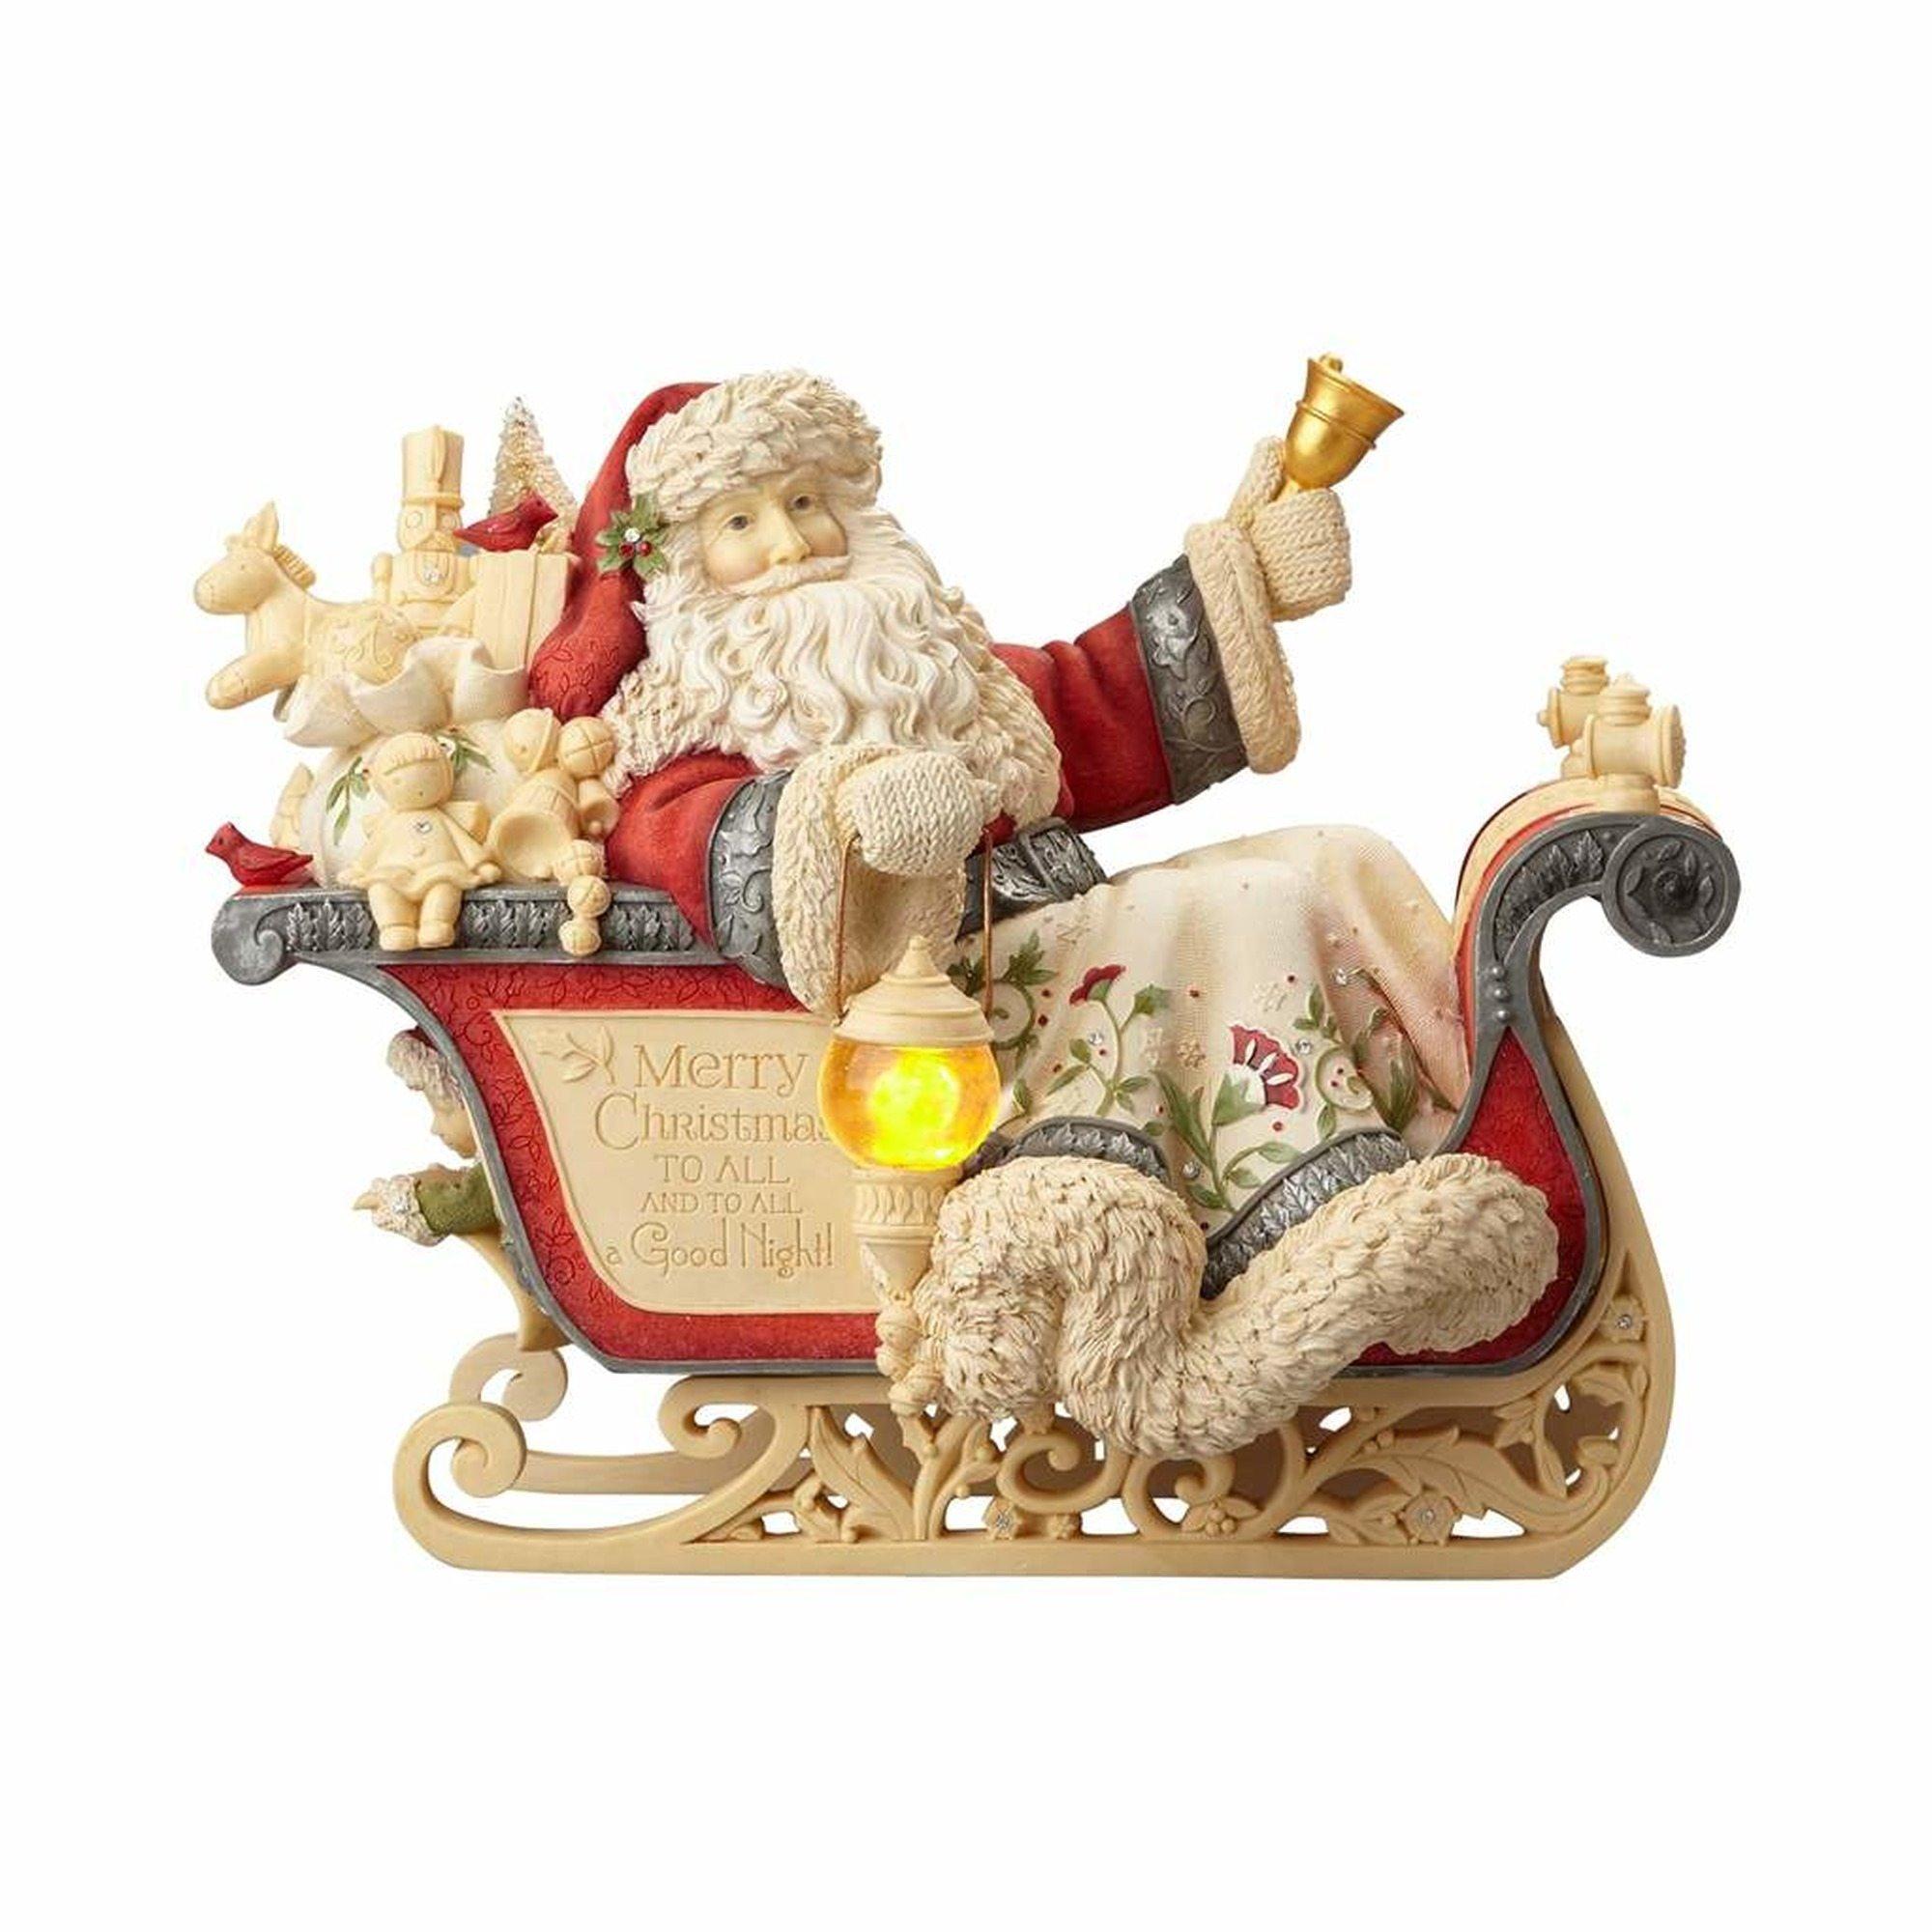 karen hahn the heart of christmas collection